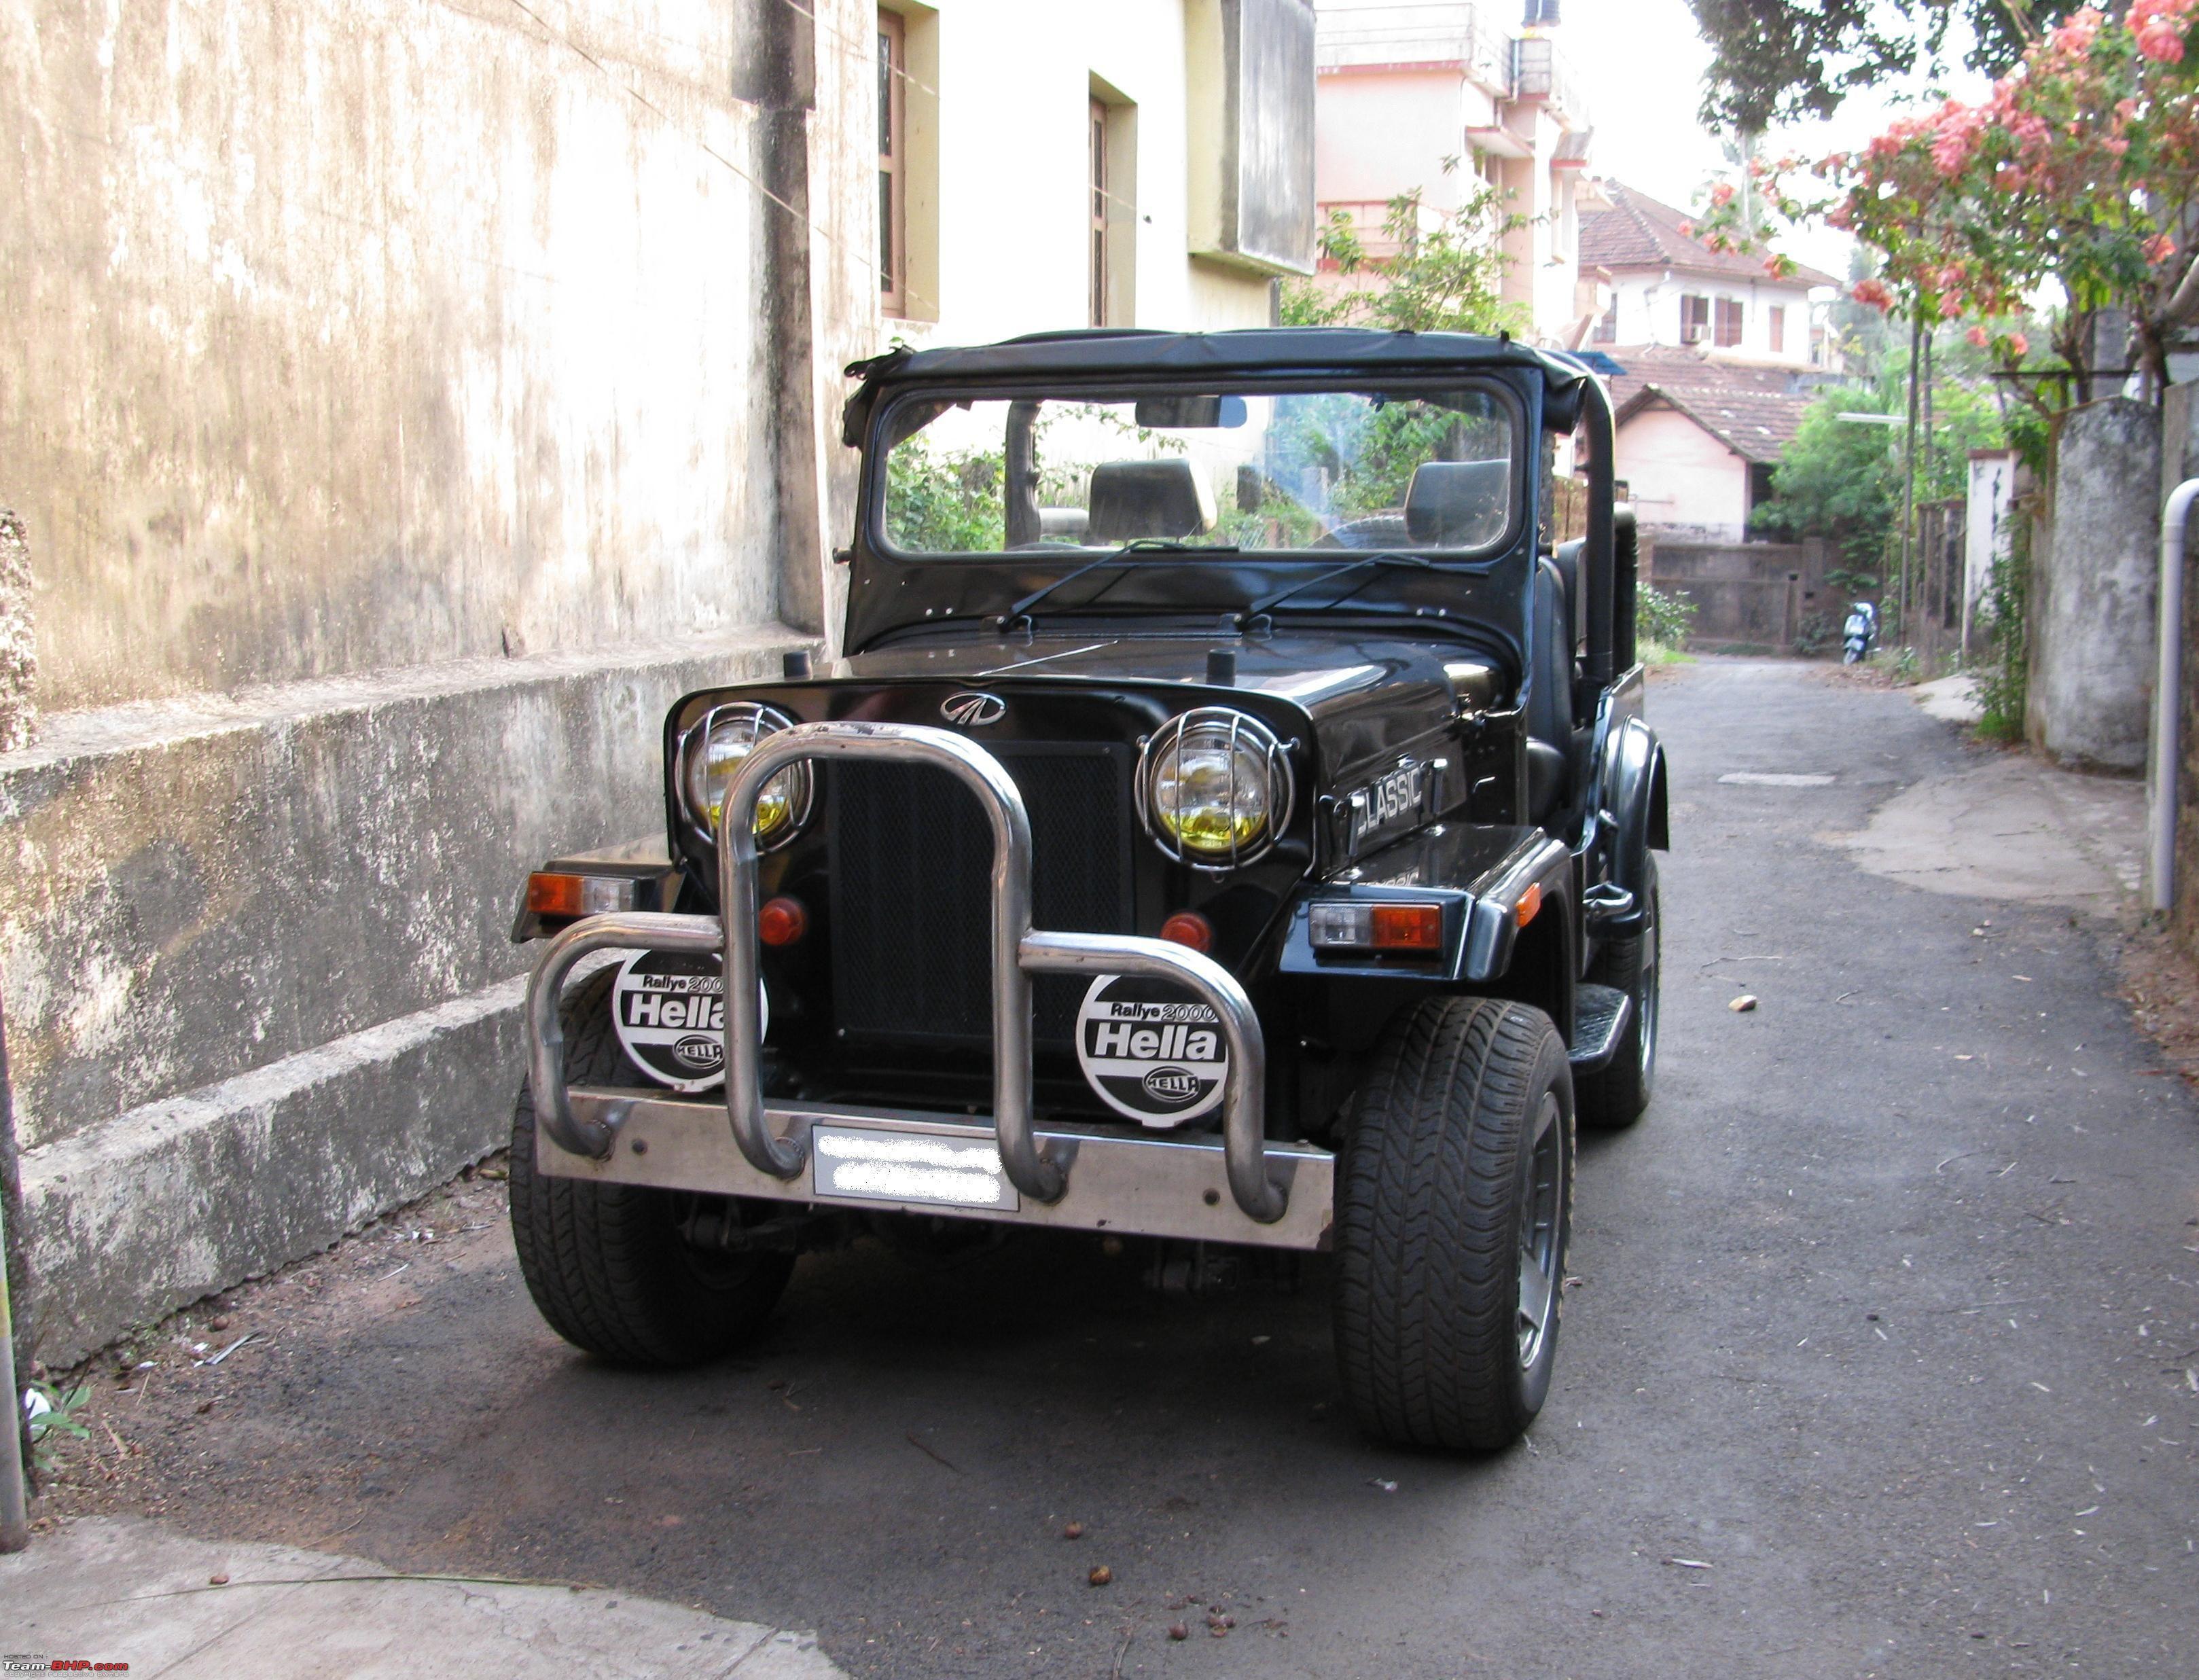 mahindra classic black the best jeeps pinterest jeeps and wheels rh pinterest com Mahindra Commander Jeep Mahindra and Mahindra Jeeps Kerala